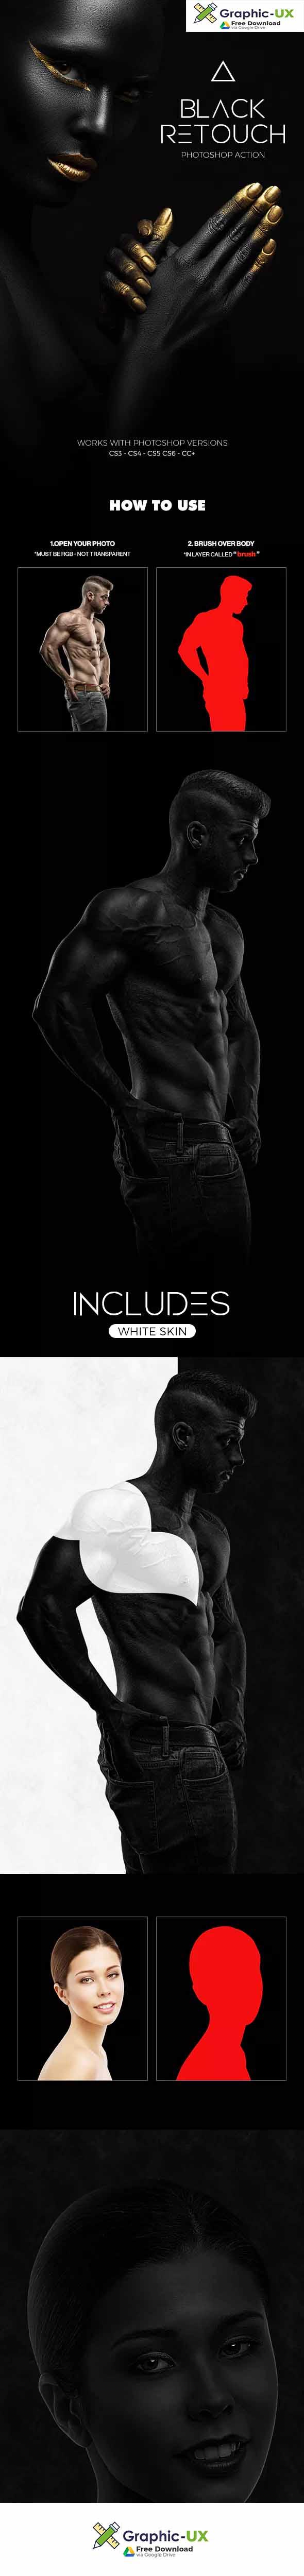 Black white retouch photoshop action graphicux